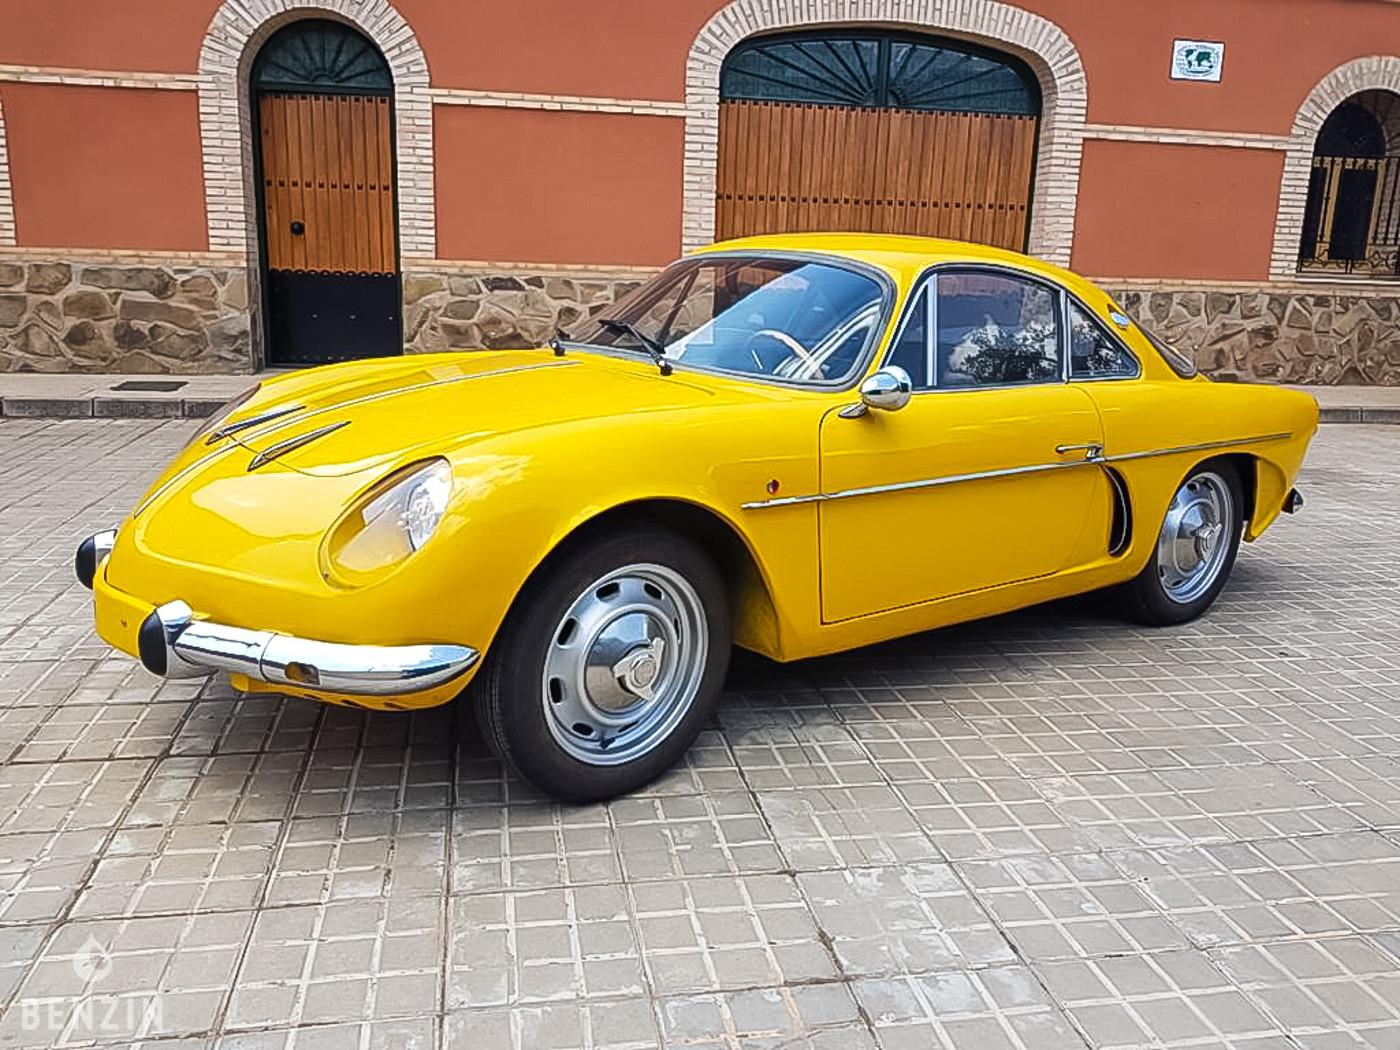 Alpine A108 Berlinette 1966 benzin fr img_6013d0fb0b6b8